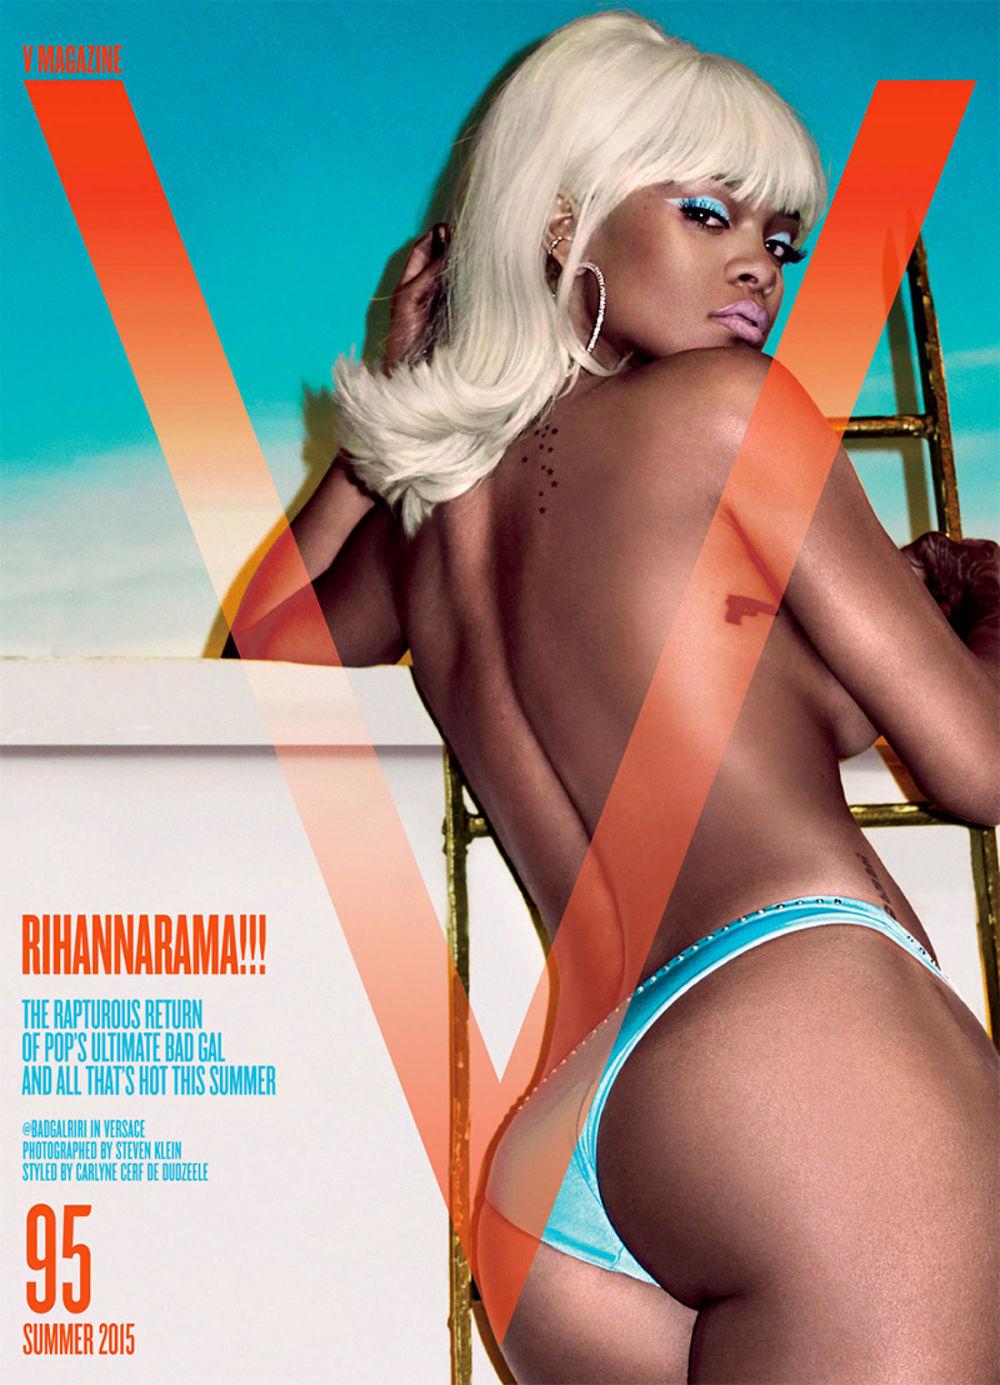 Rihanna for V magazine. Do we need to say more?